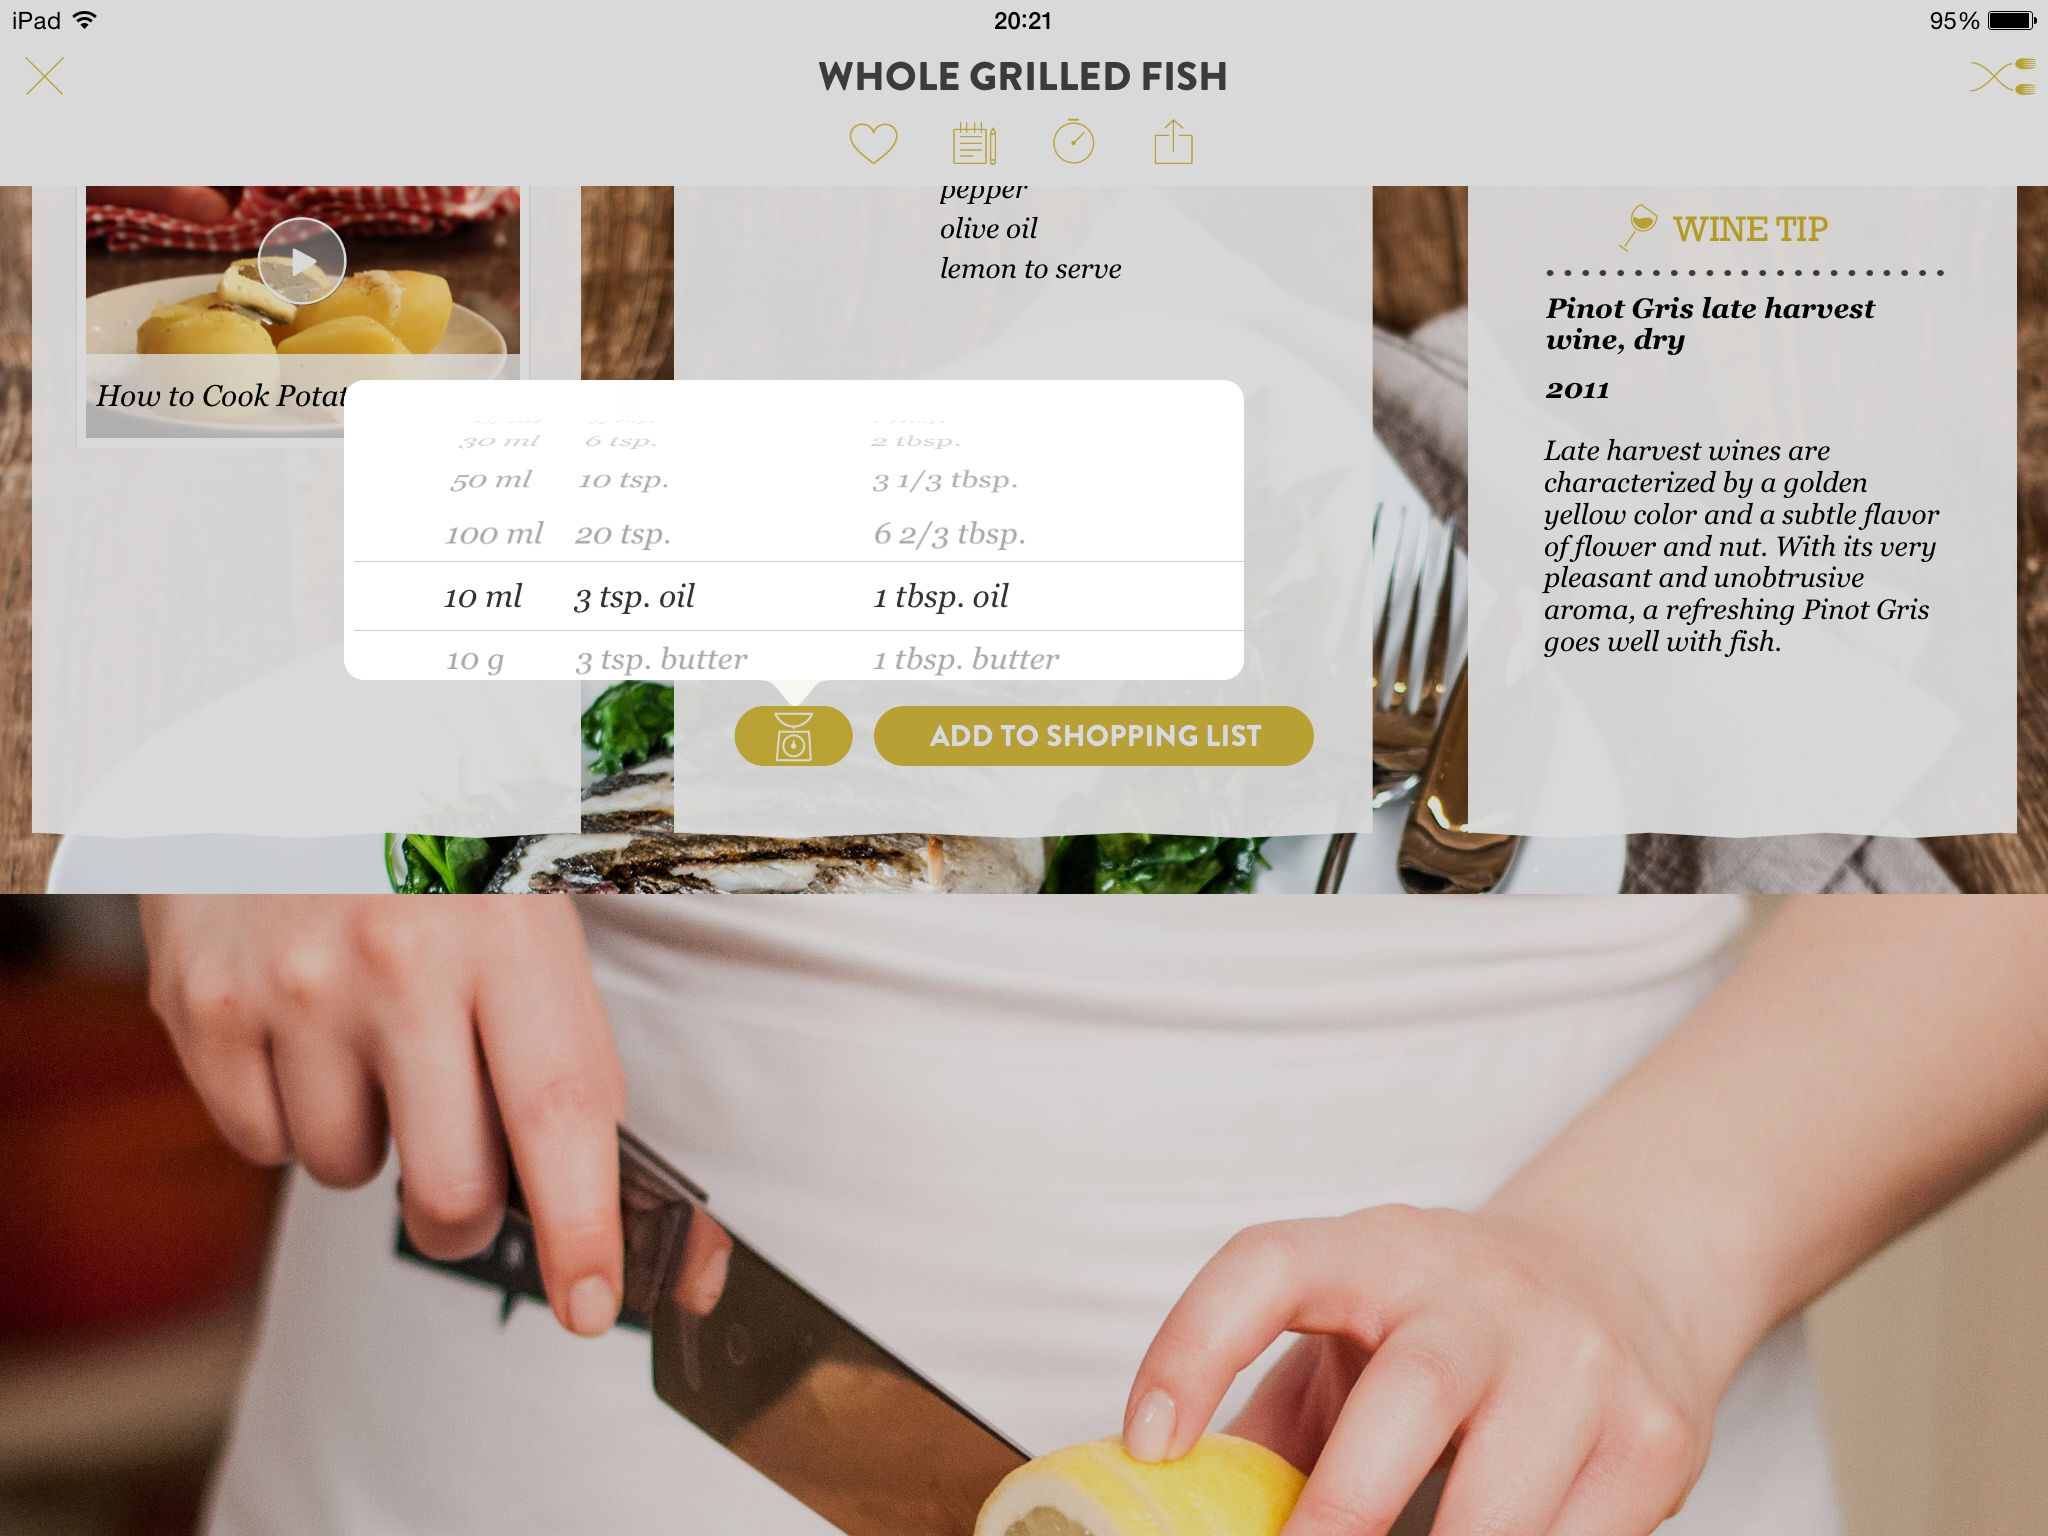 Kitchen stories, measurements, selection, iPad   UI   Pinterest ...